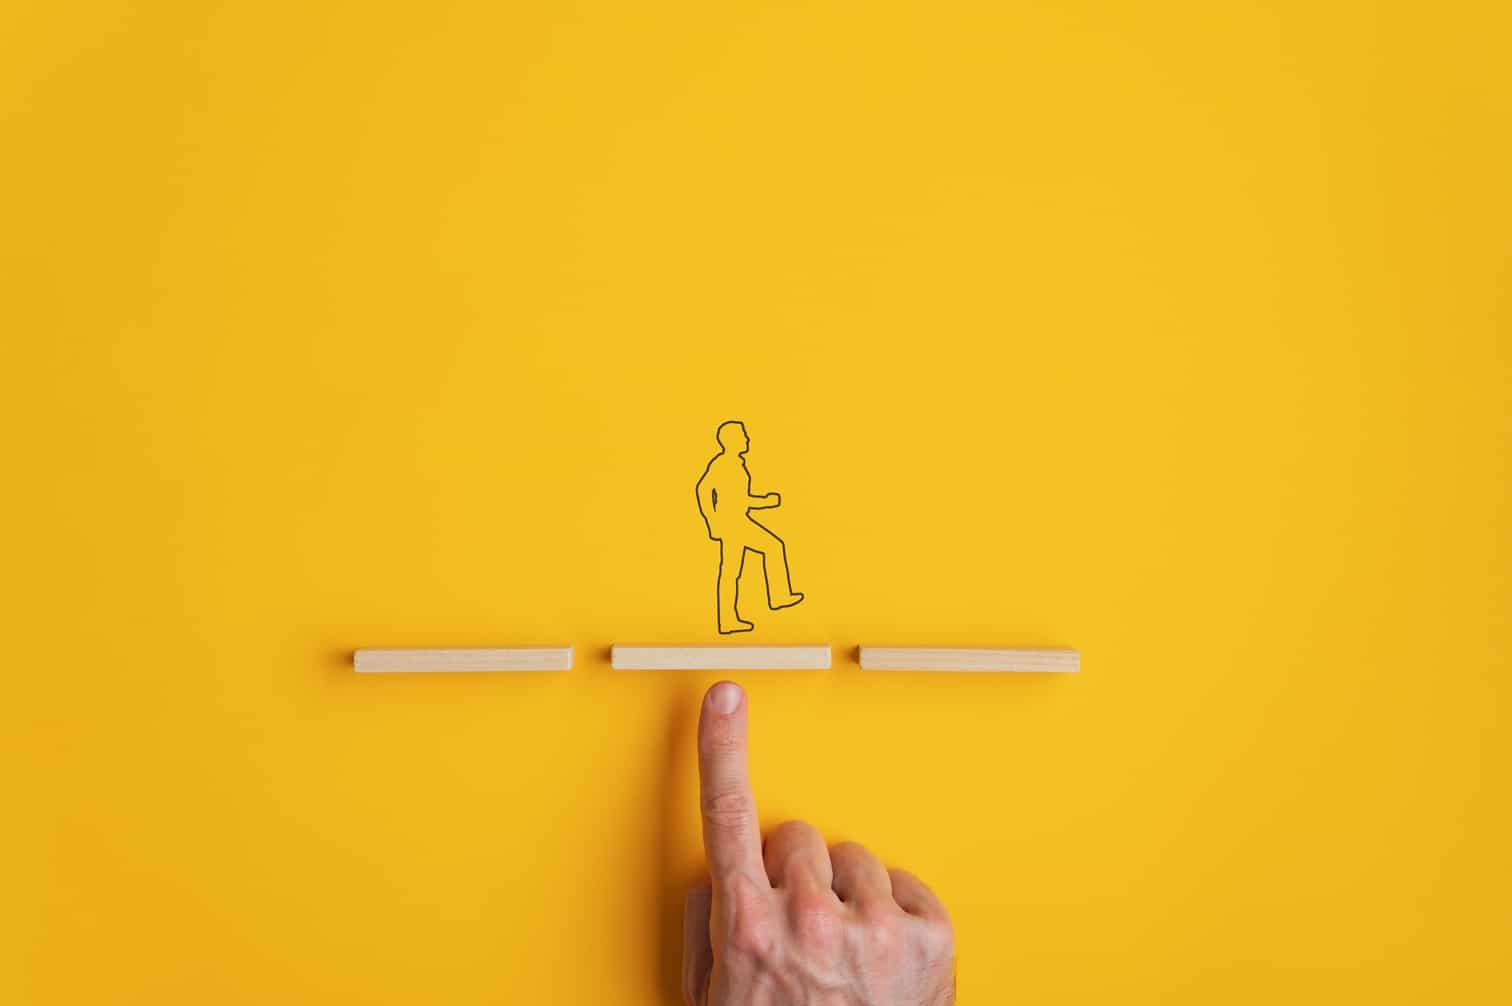 fixed-mindset-vs-growth-mindset-alignthoughts